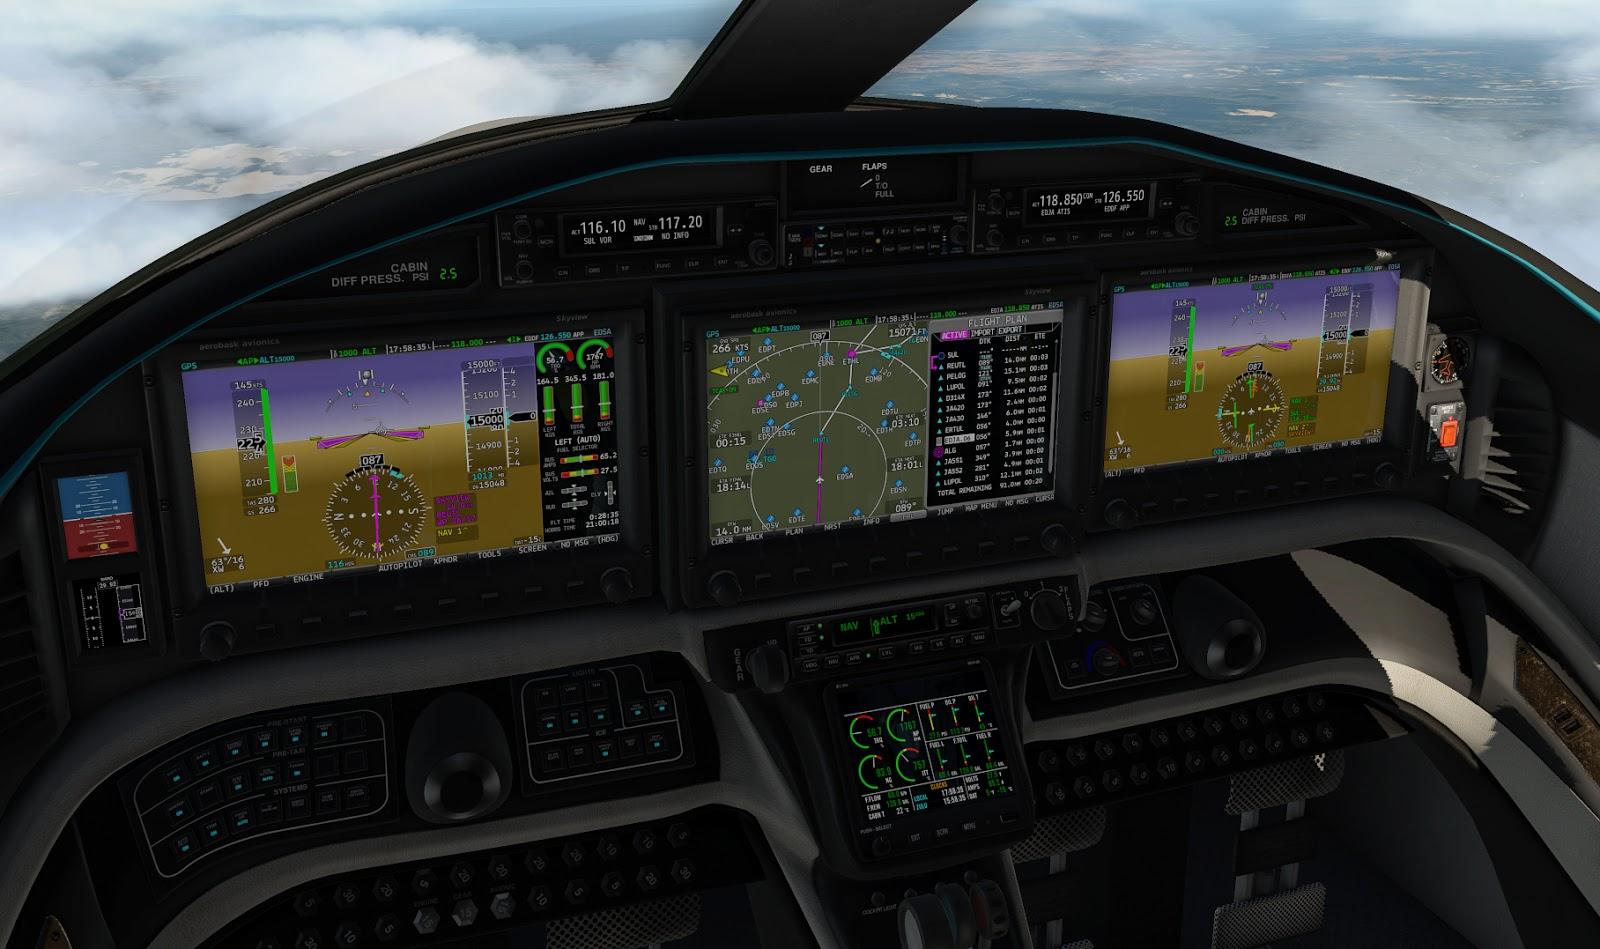 Aerobask Epic 1000 Skyview